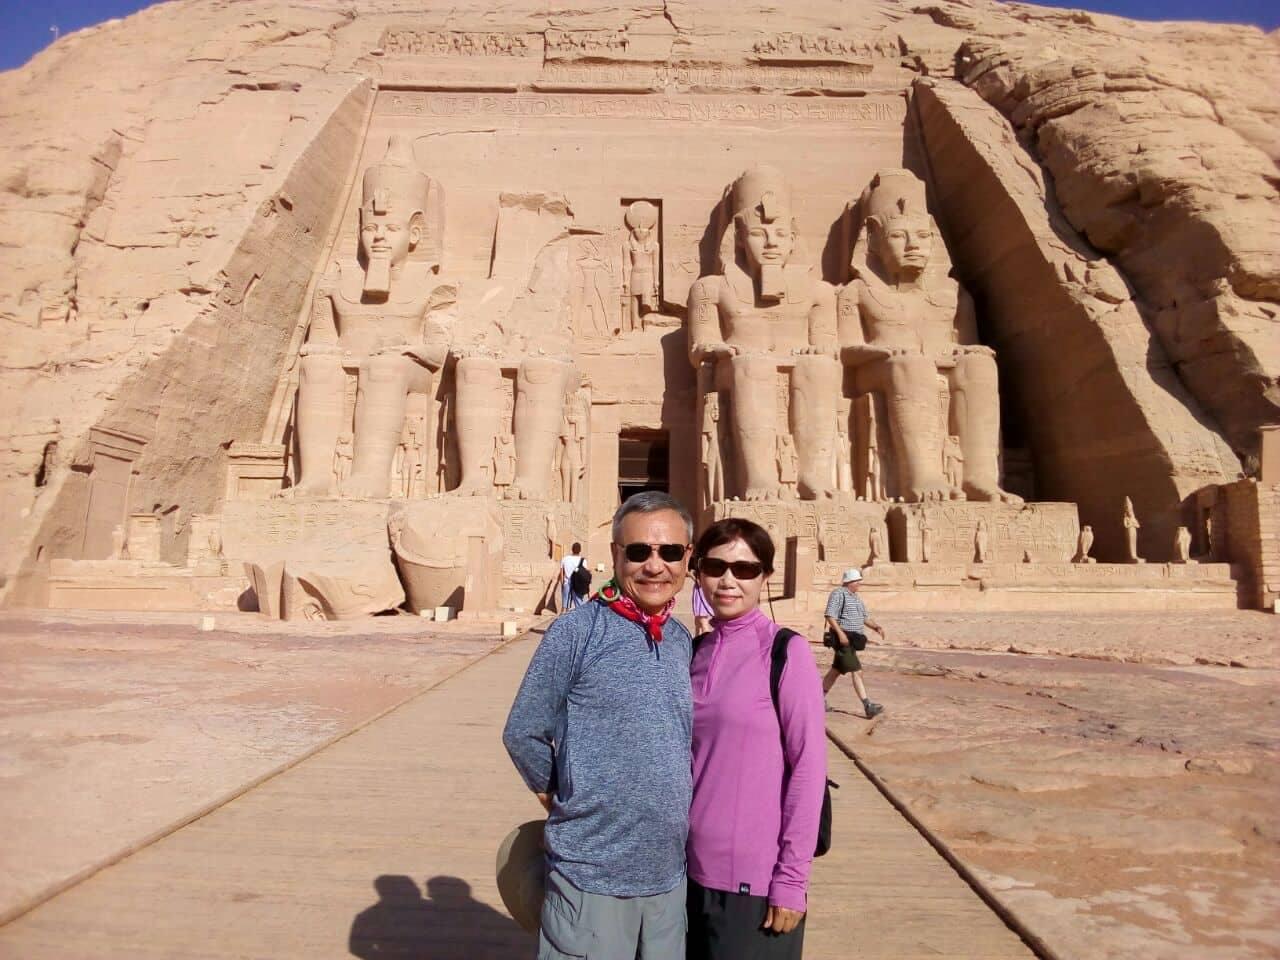 visite el templo de abu simbel con venga egipto